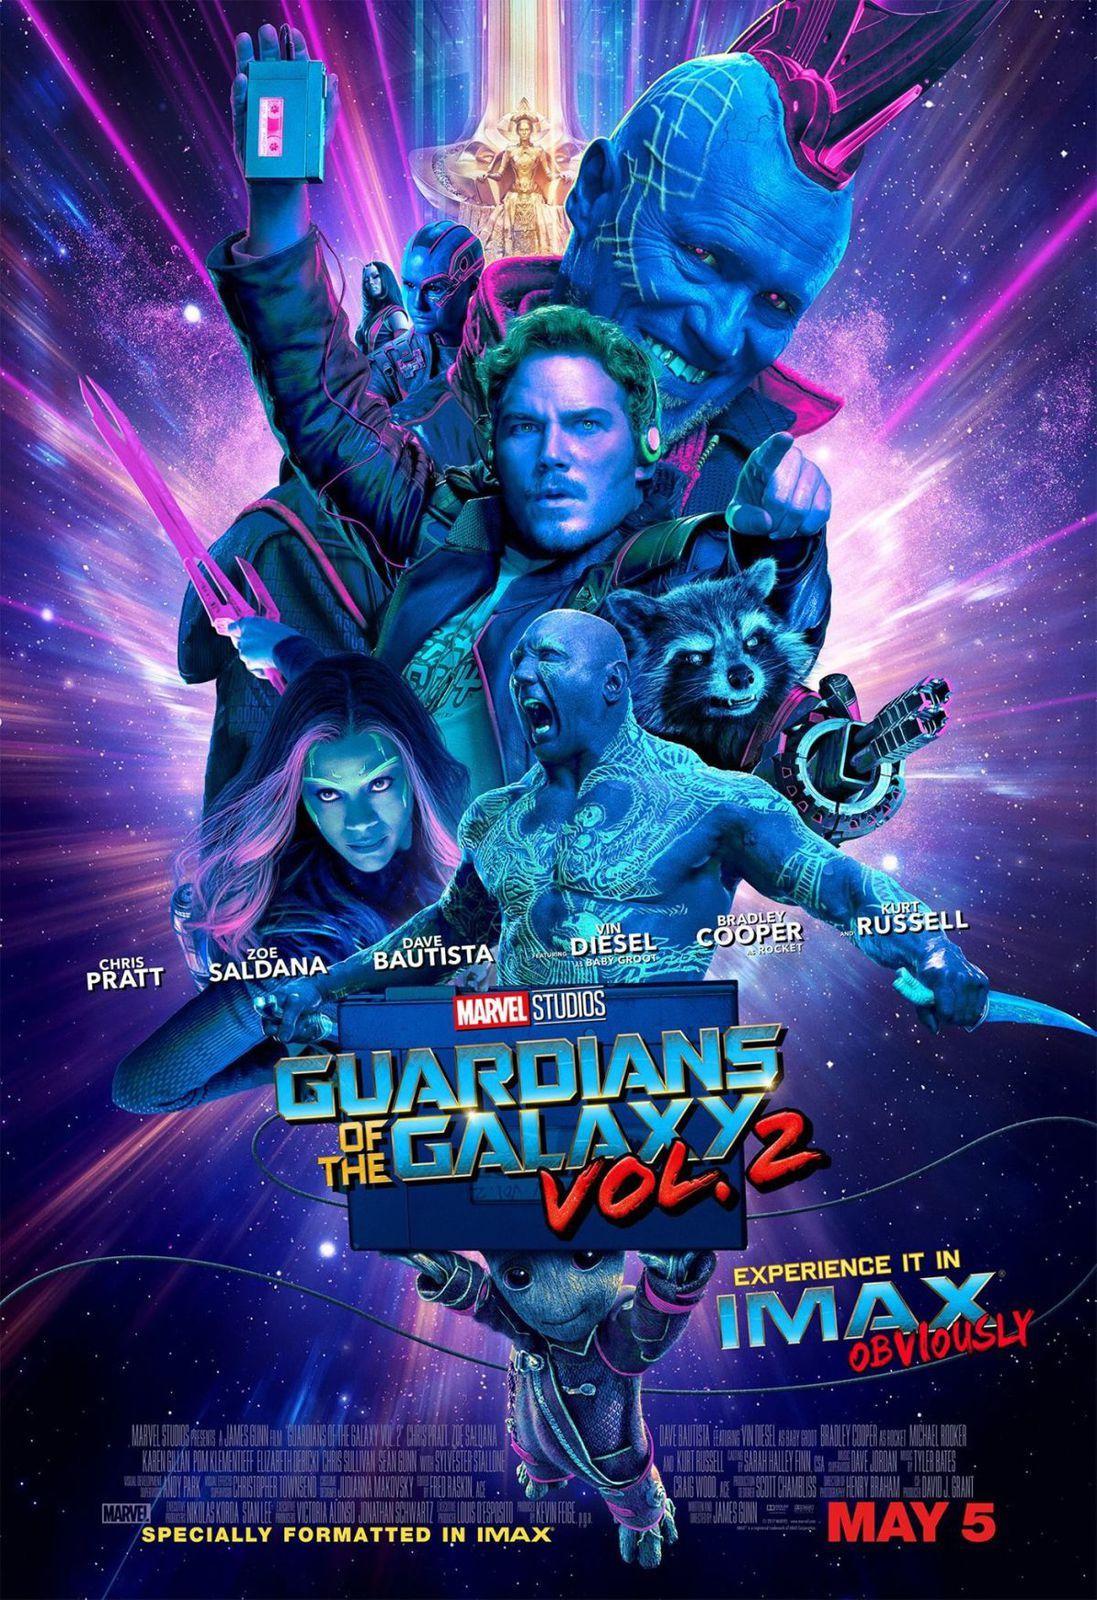 Les gardiens de la Galaxie vol 2 : poster Imax